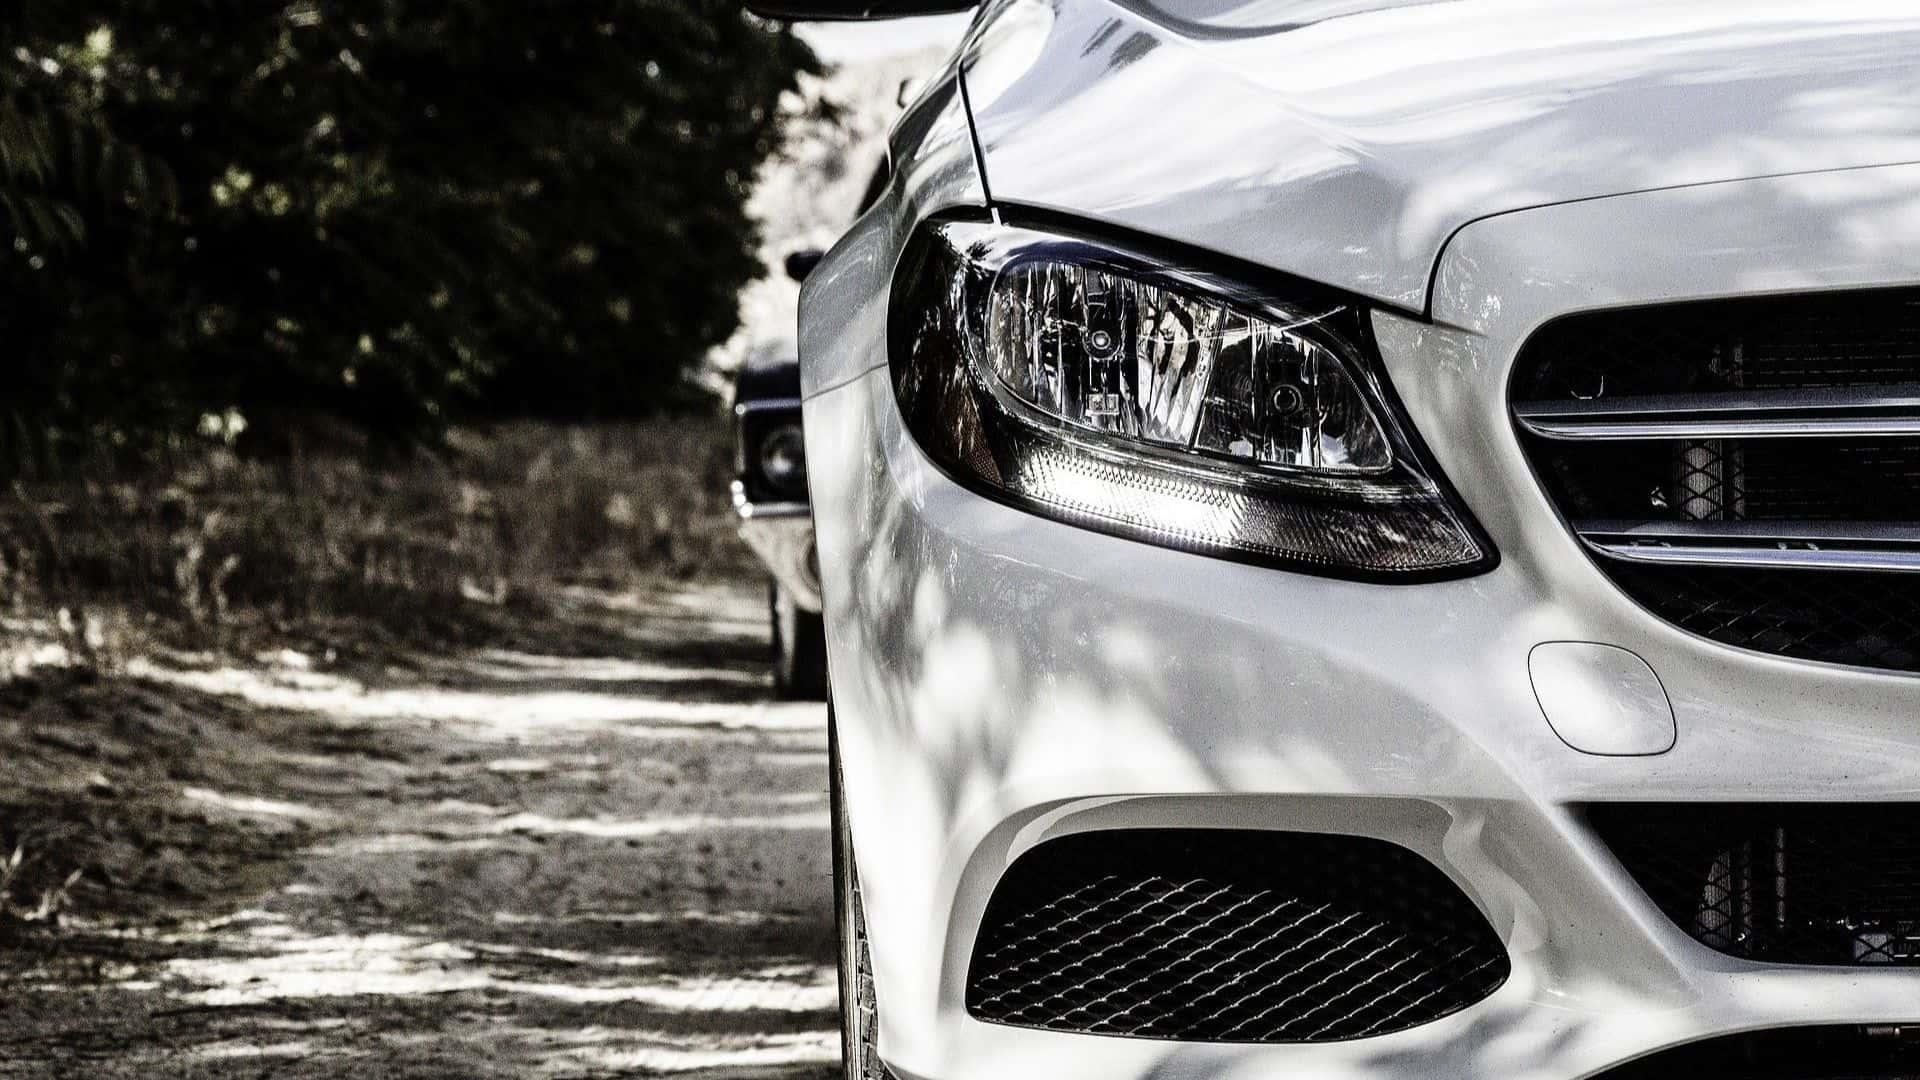 car headlight tail light visibility